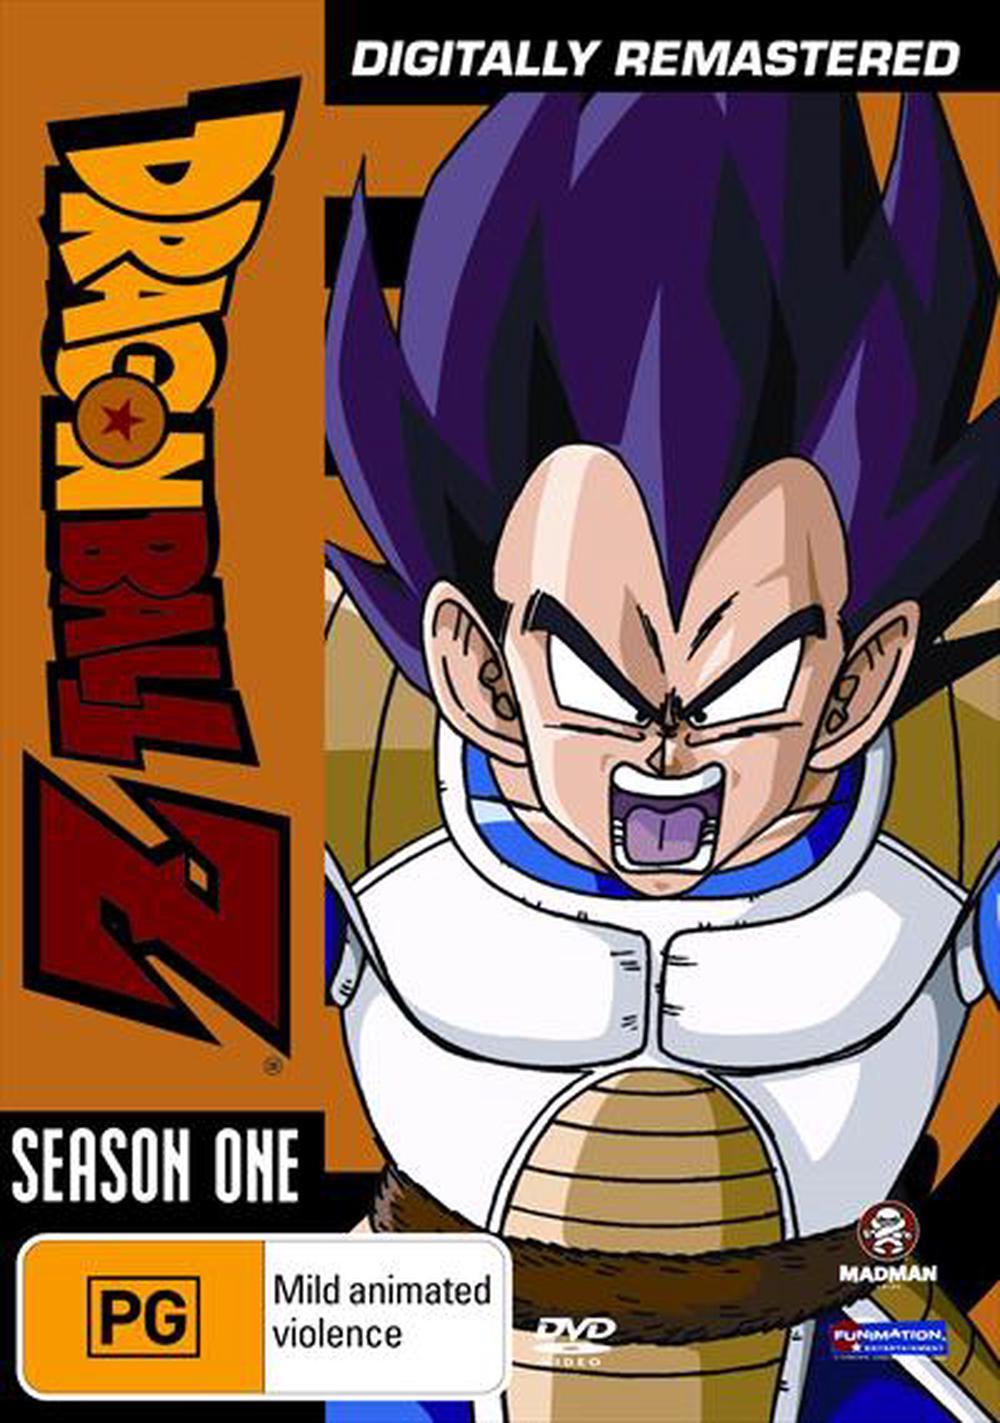 Dragon Ball Z: Season 1 - Digitally Remastered